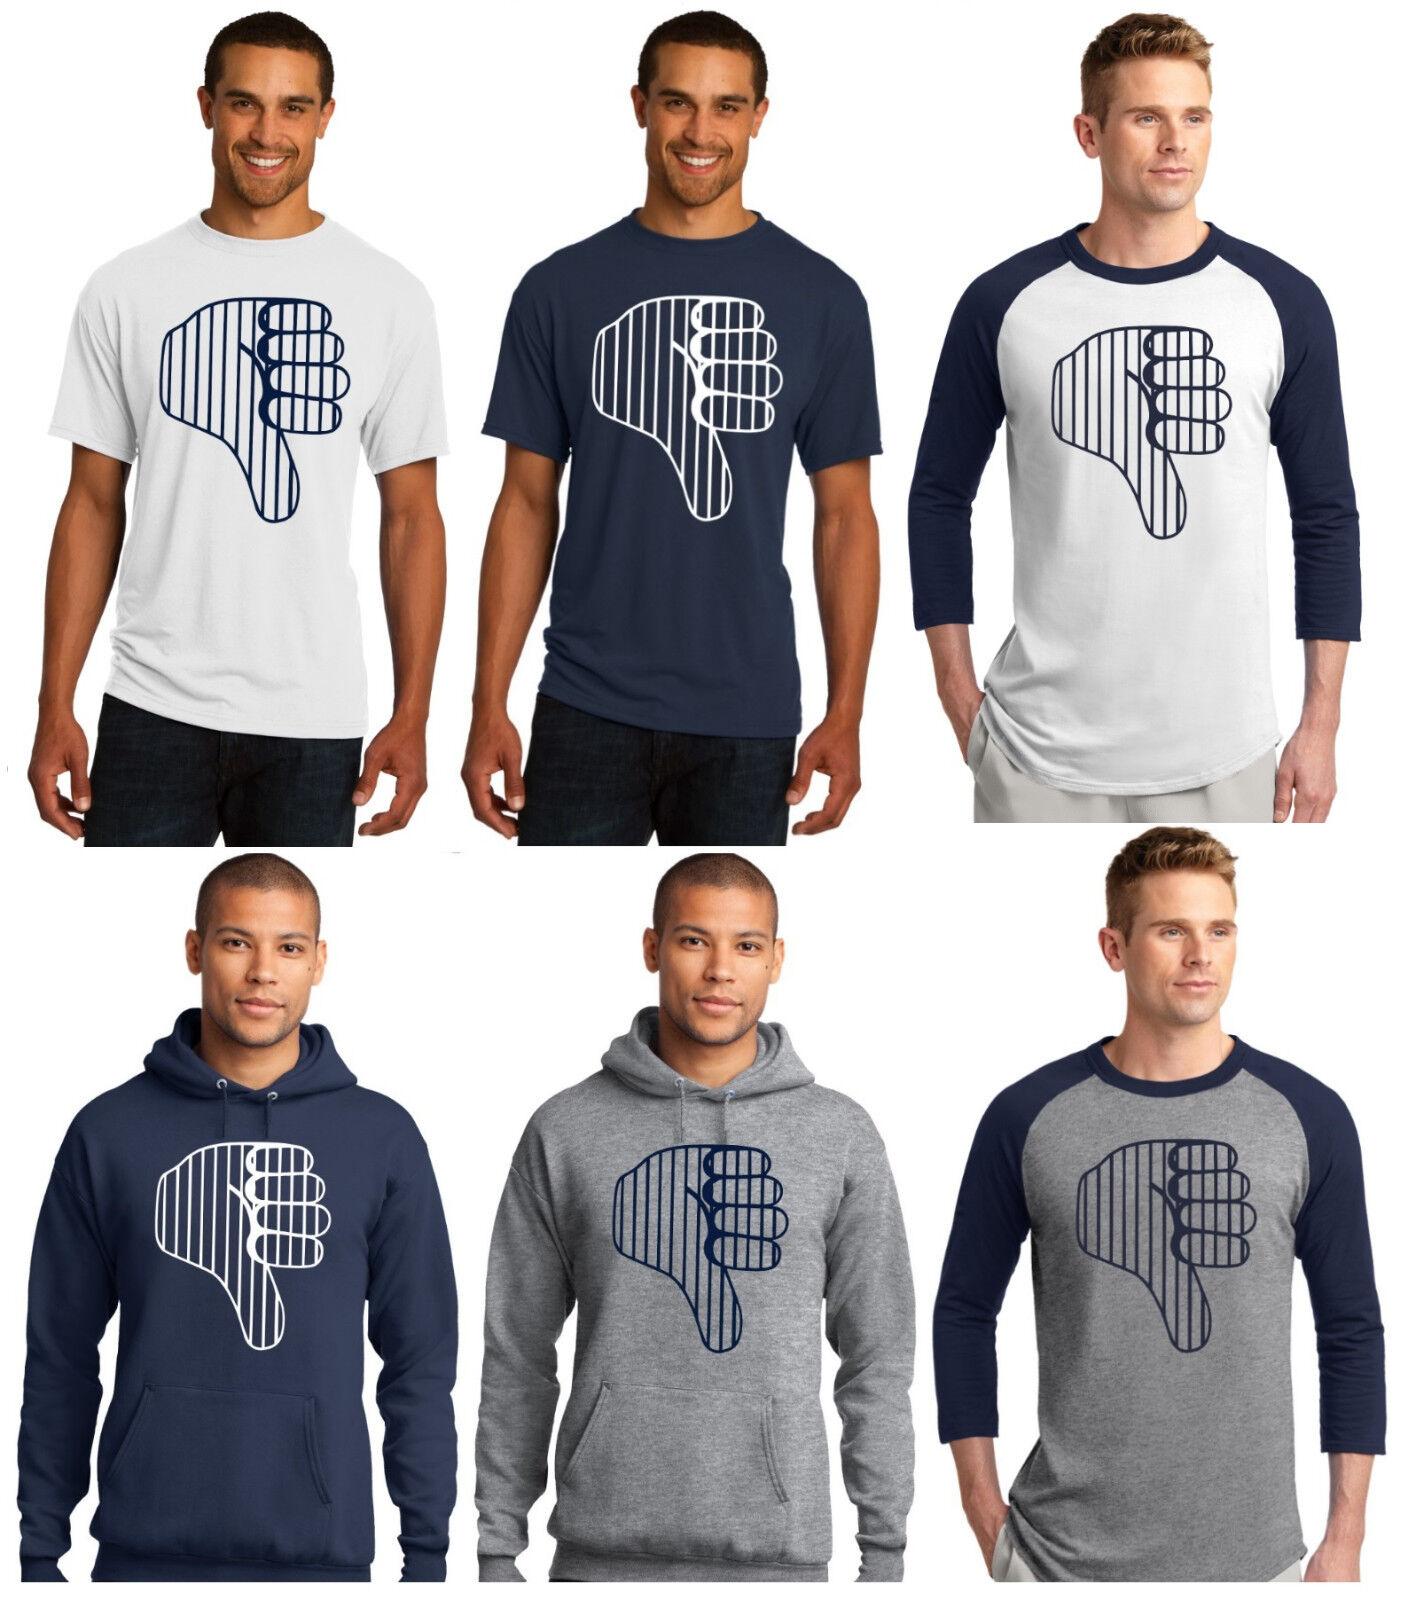 New York Yankees Pinstriped Thumbs Down Men's T-Shirt or Hoodie Sz S - 5XL